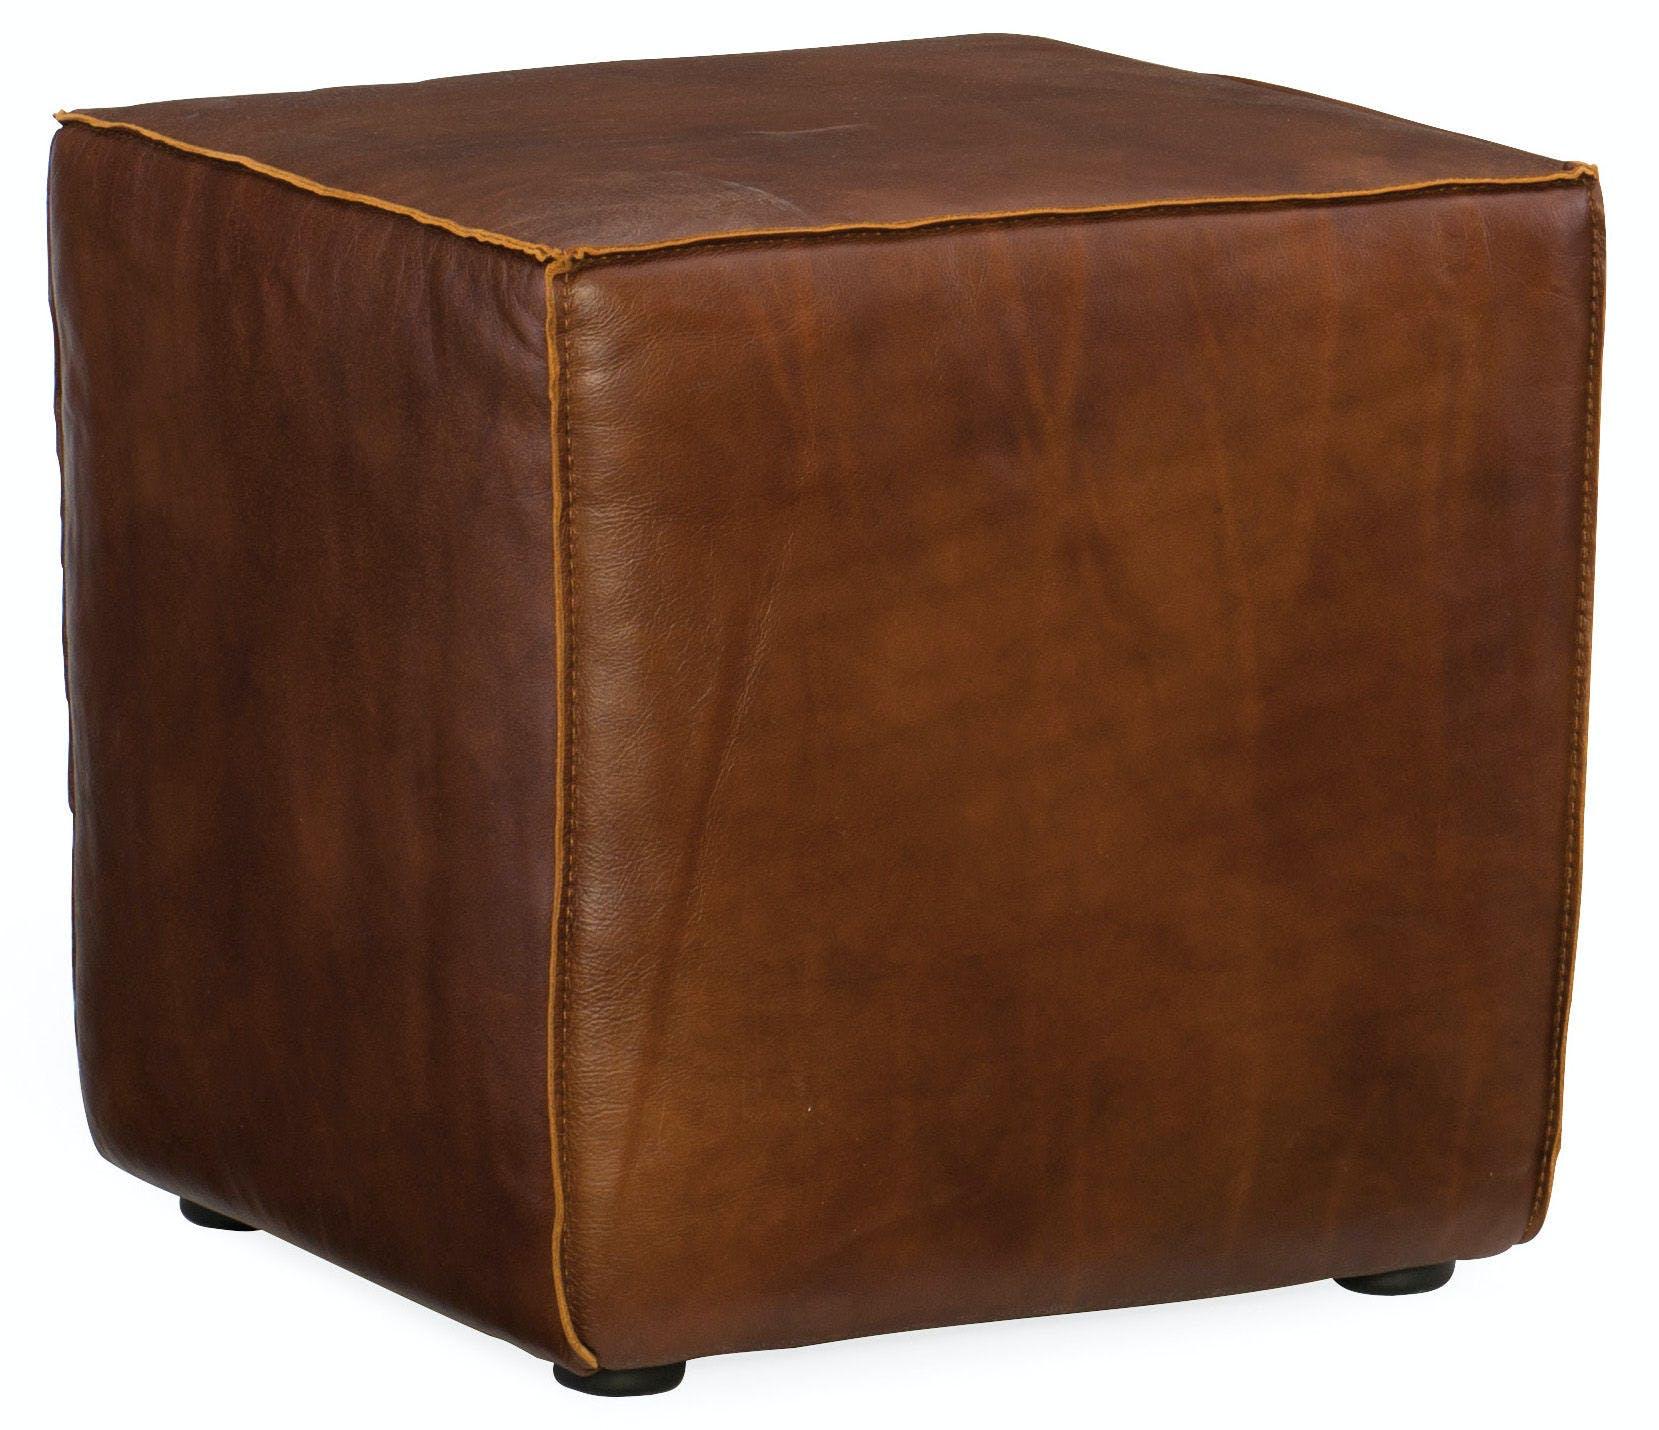 Hooker Furniture Living Room Quebert Cube Ottoman Co393 087